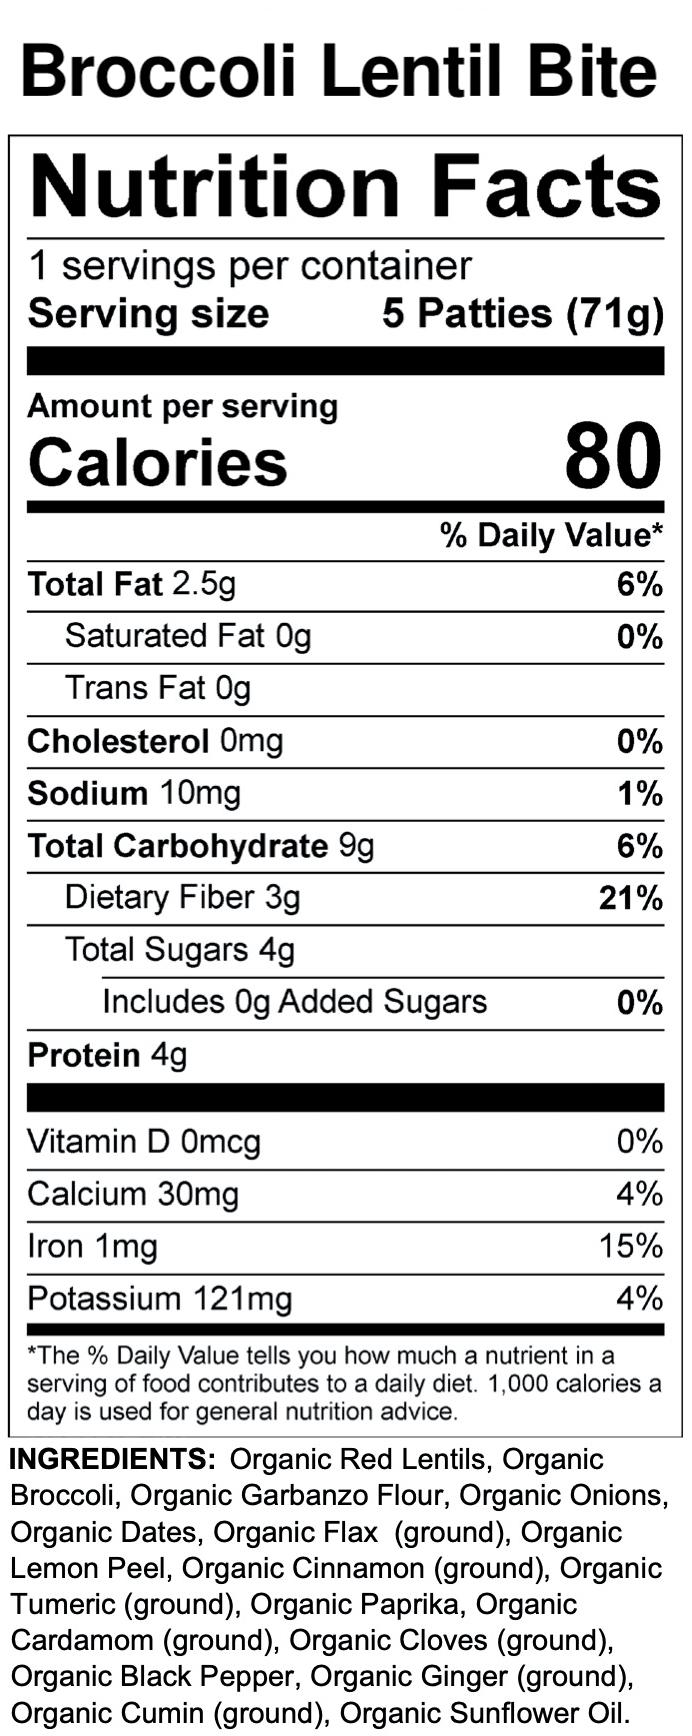 Yumi Broccoli Lentil Bite nutrition facts